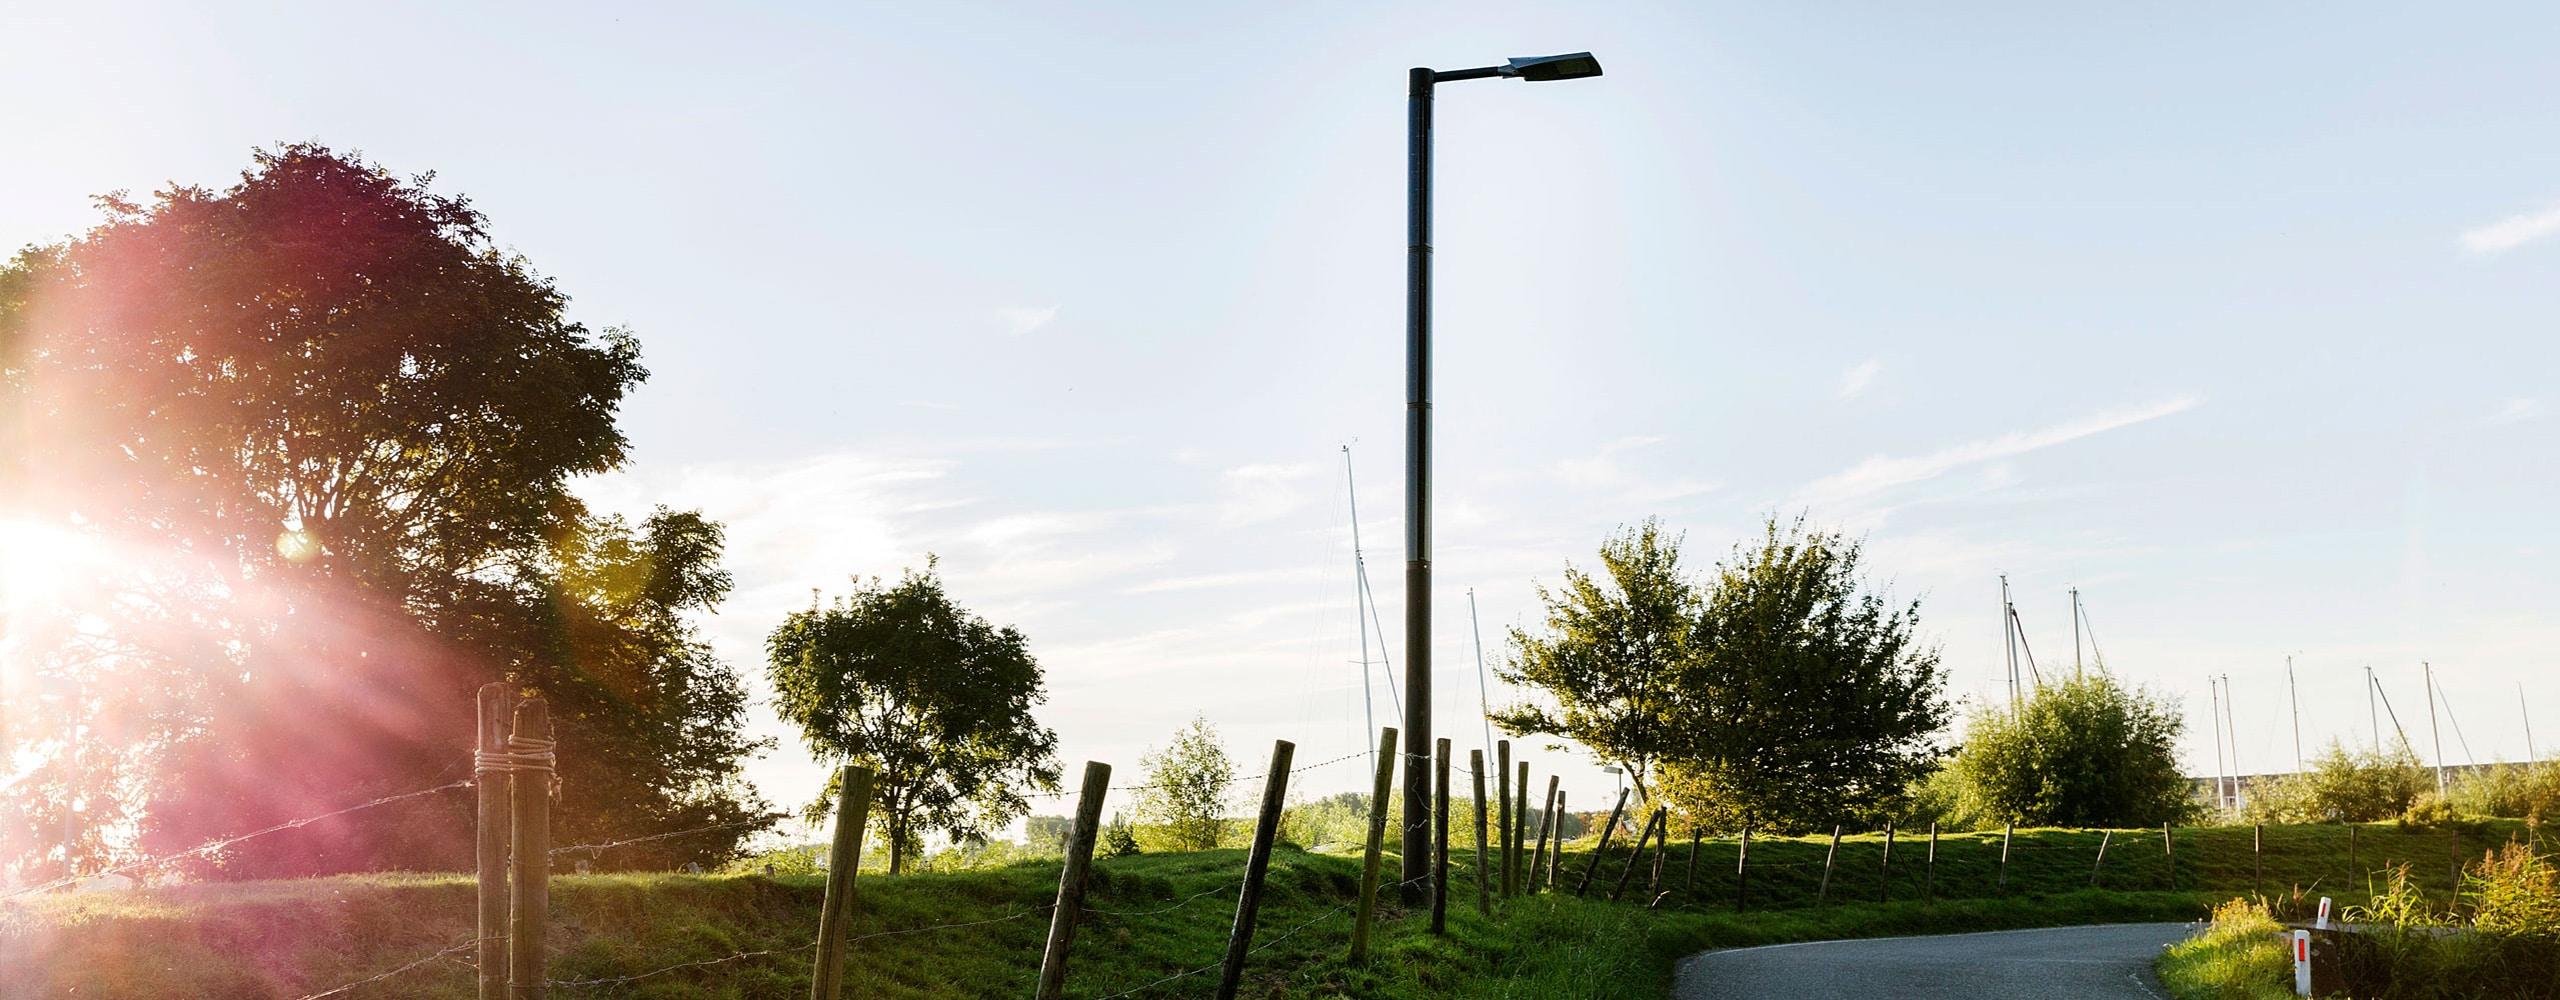 Farola solar - Poste de luz negro Soluxio FlexSol alumbrado público solar off-grid